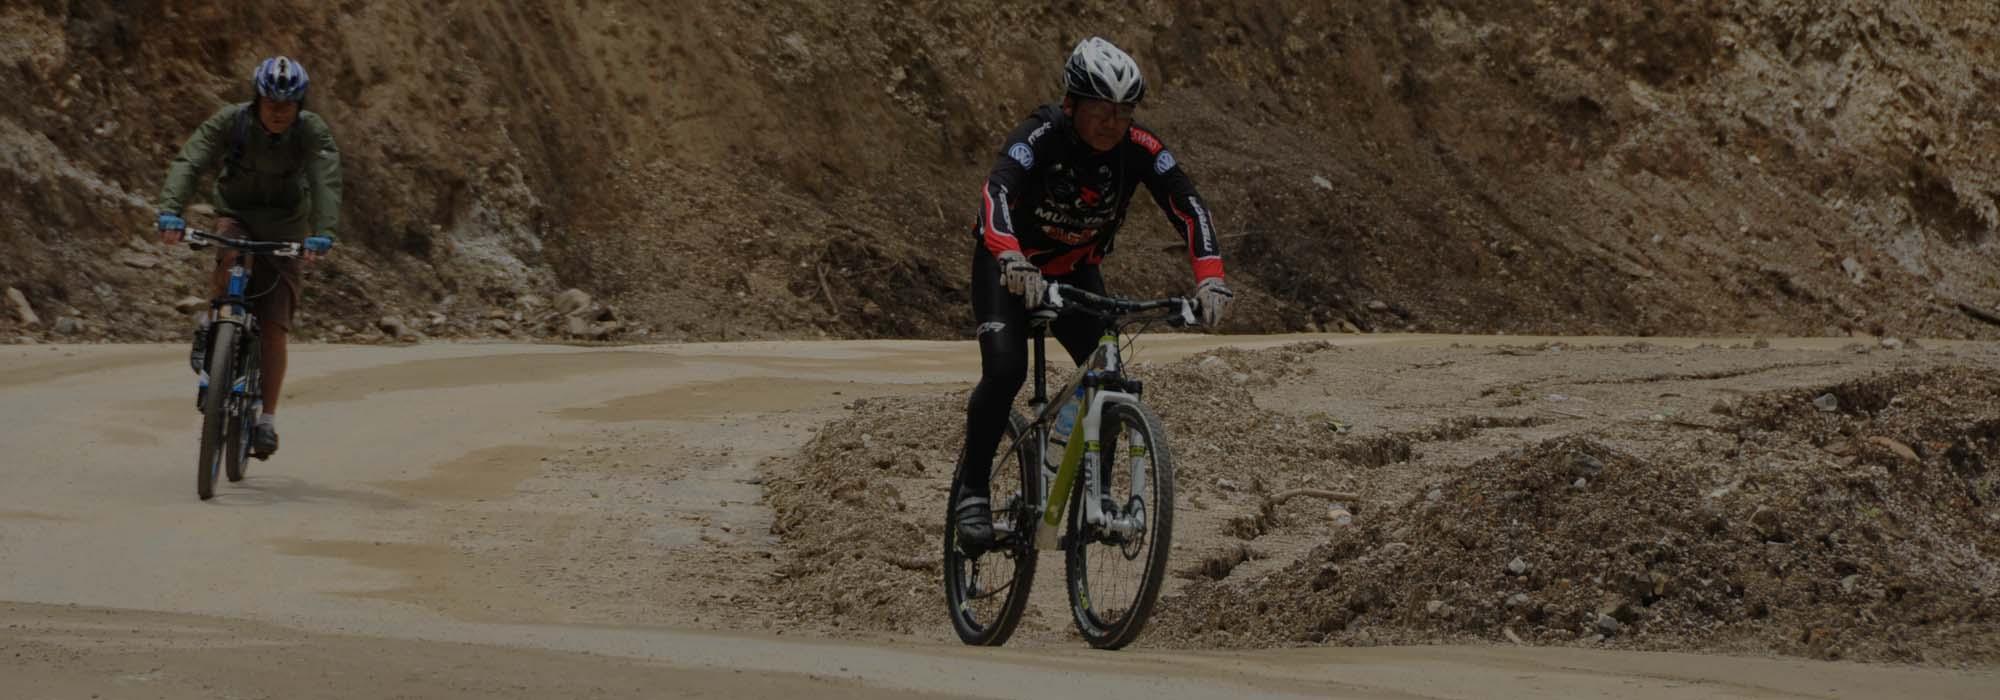 Central Bhutan Bicycle Tour 13 Days